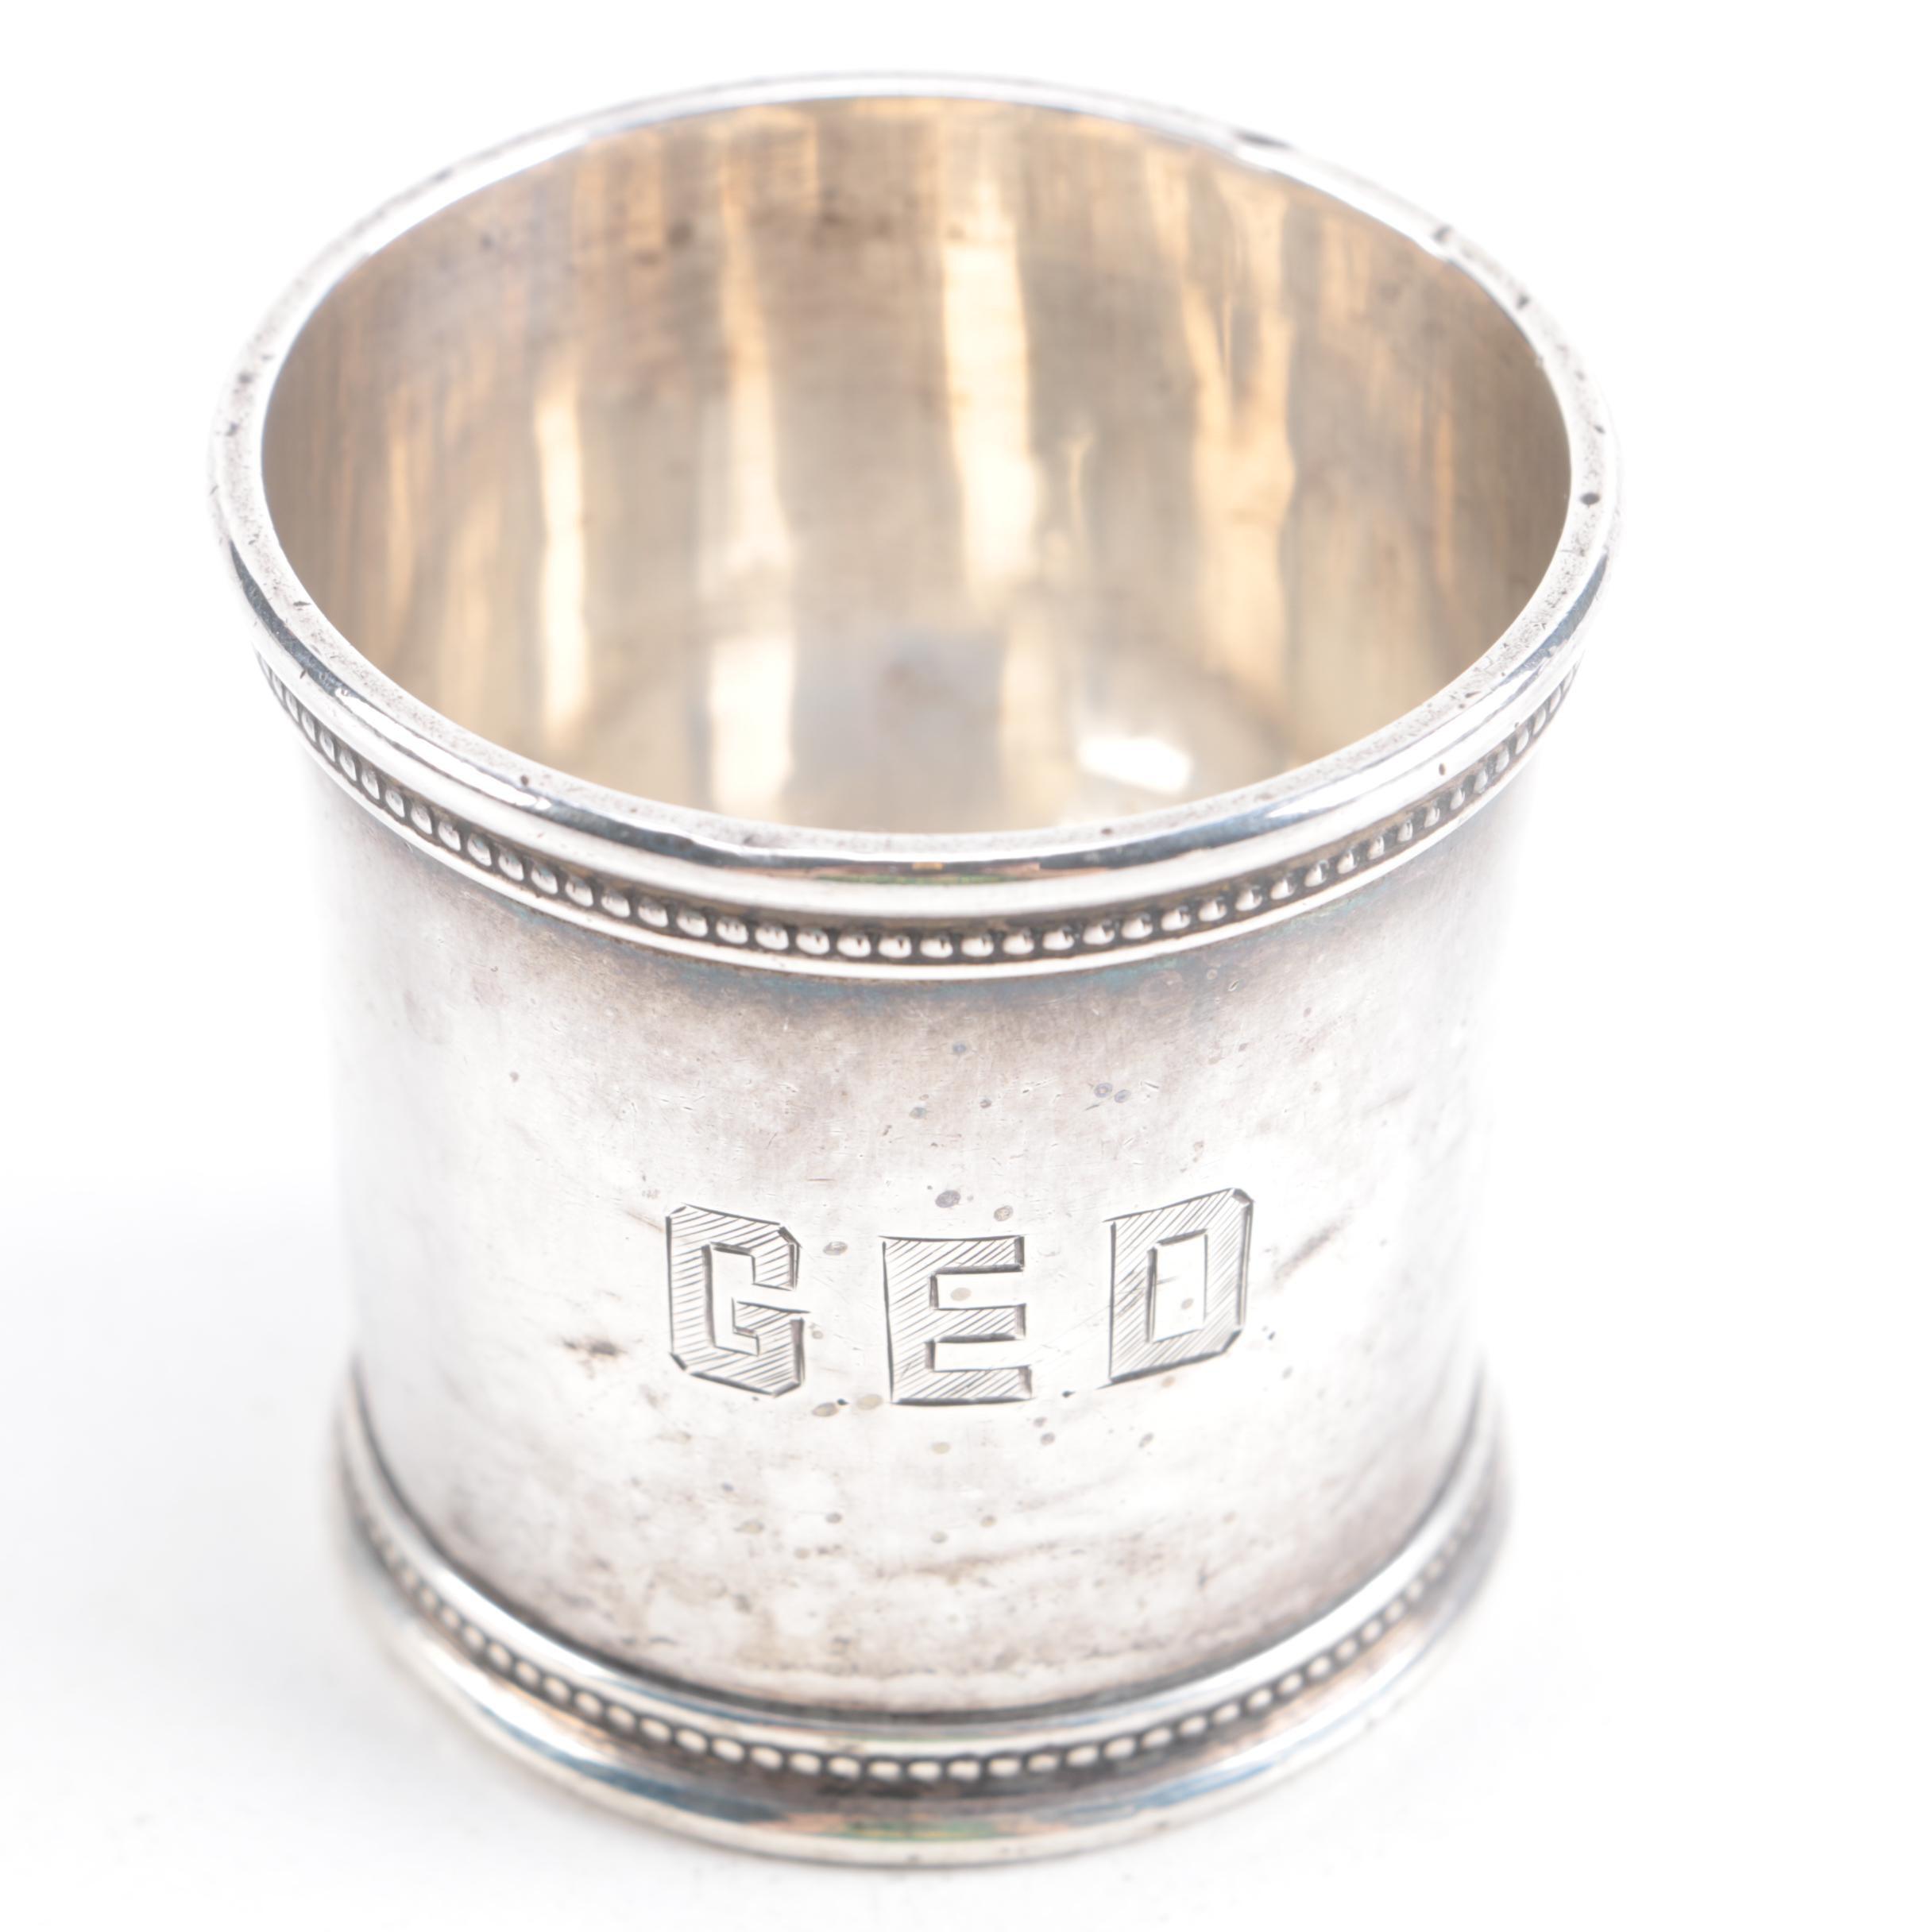 Sterling Silver Presidential LBJ Mint Julep Cup by Mark J. Scearce